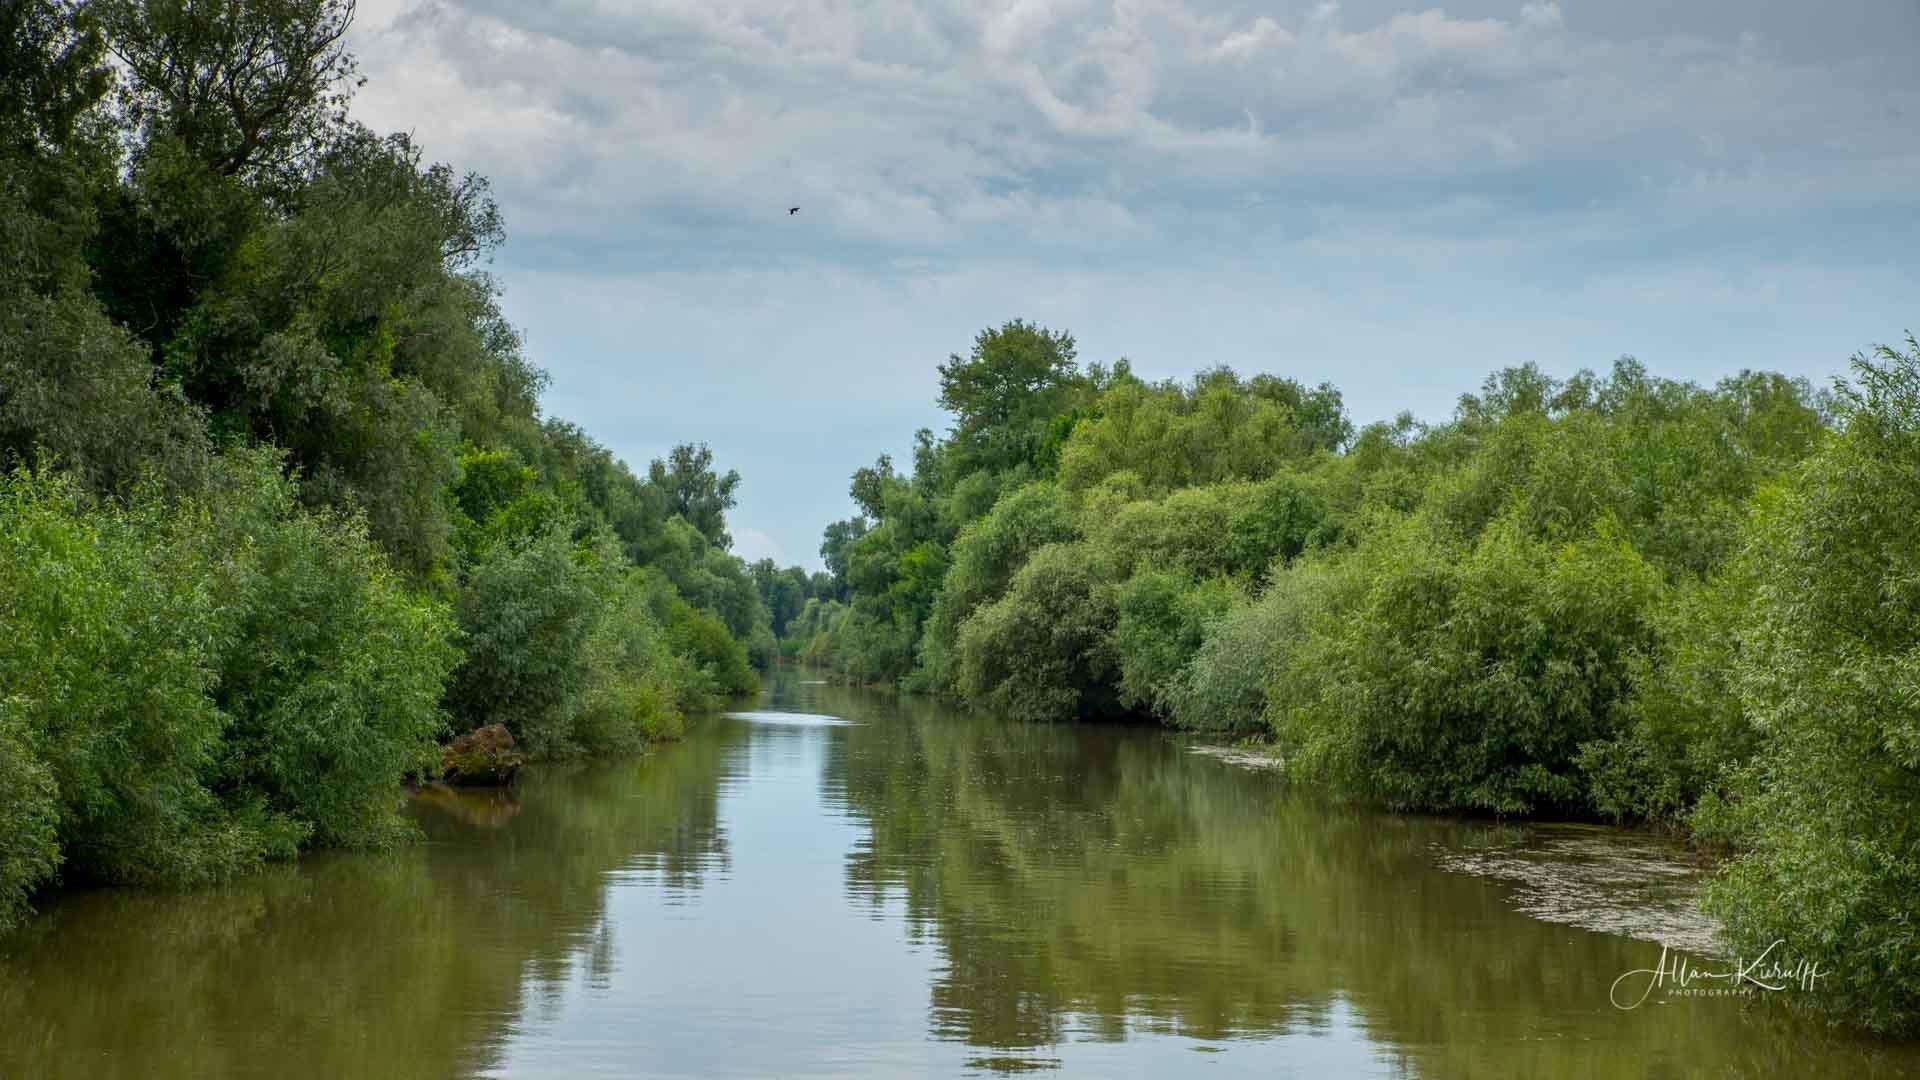 Donau Deltaet 43